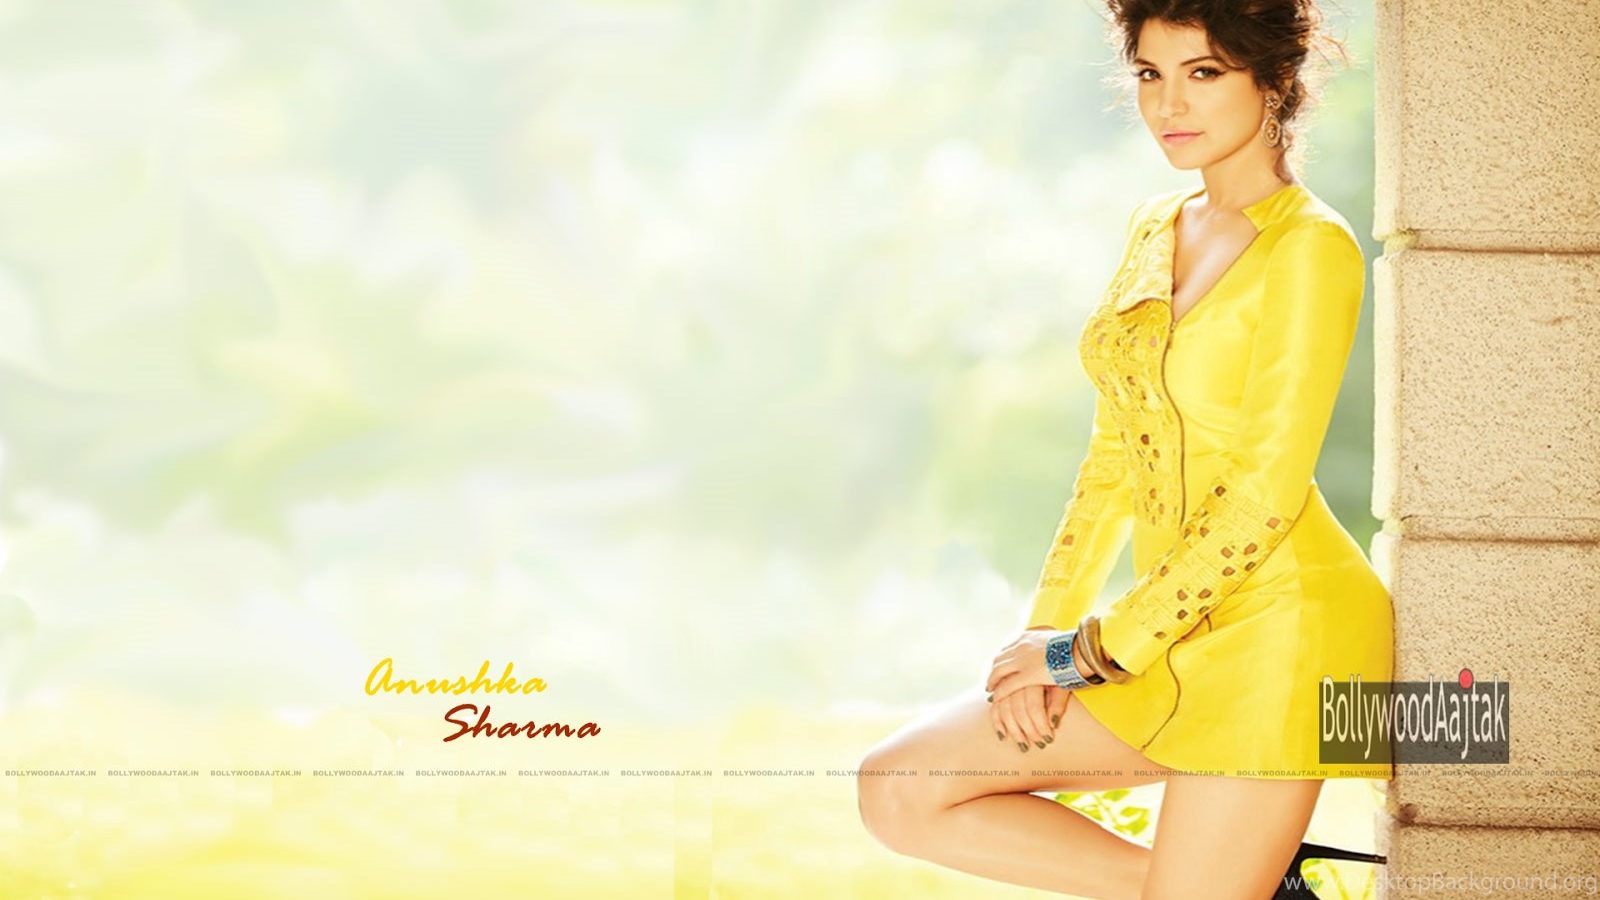 anushka sharma bikini: anushka sharma hot wallpapers desktop background